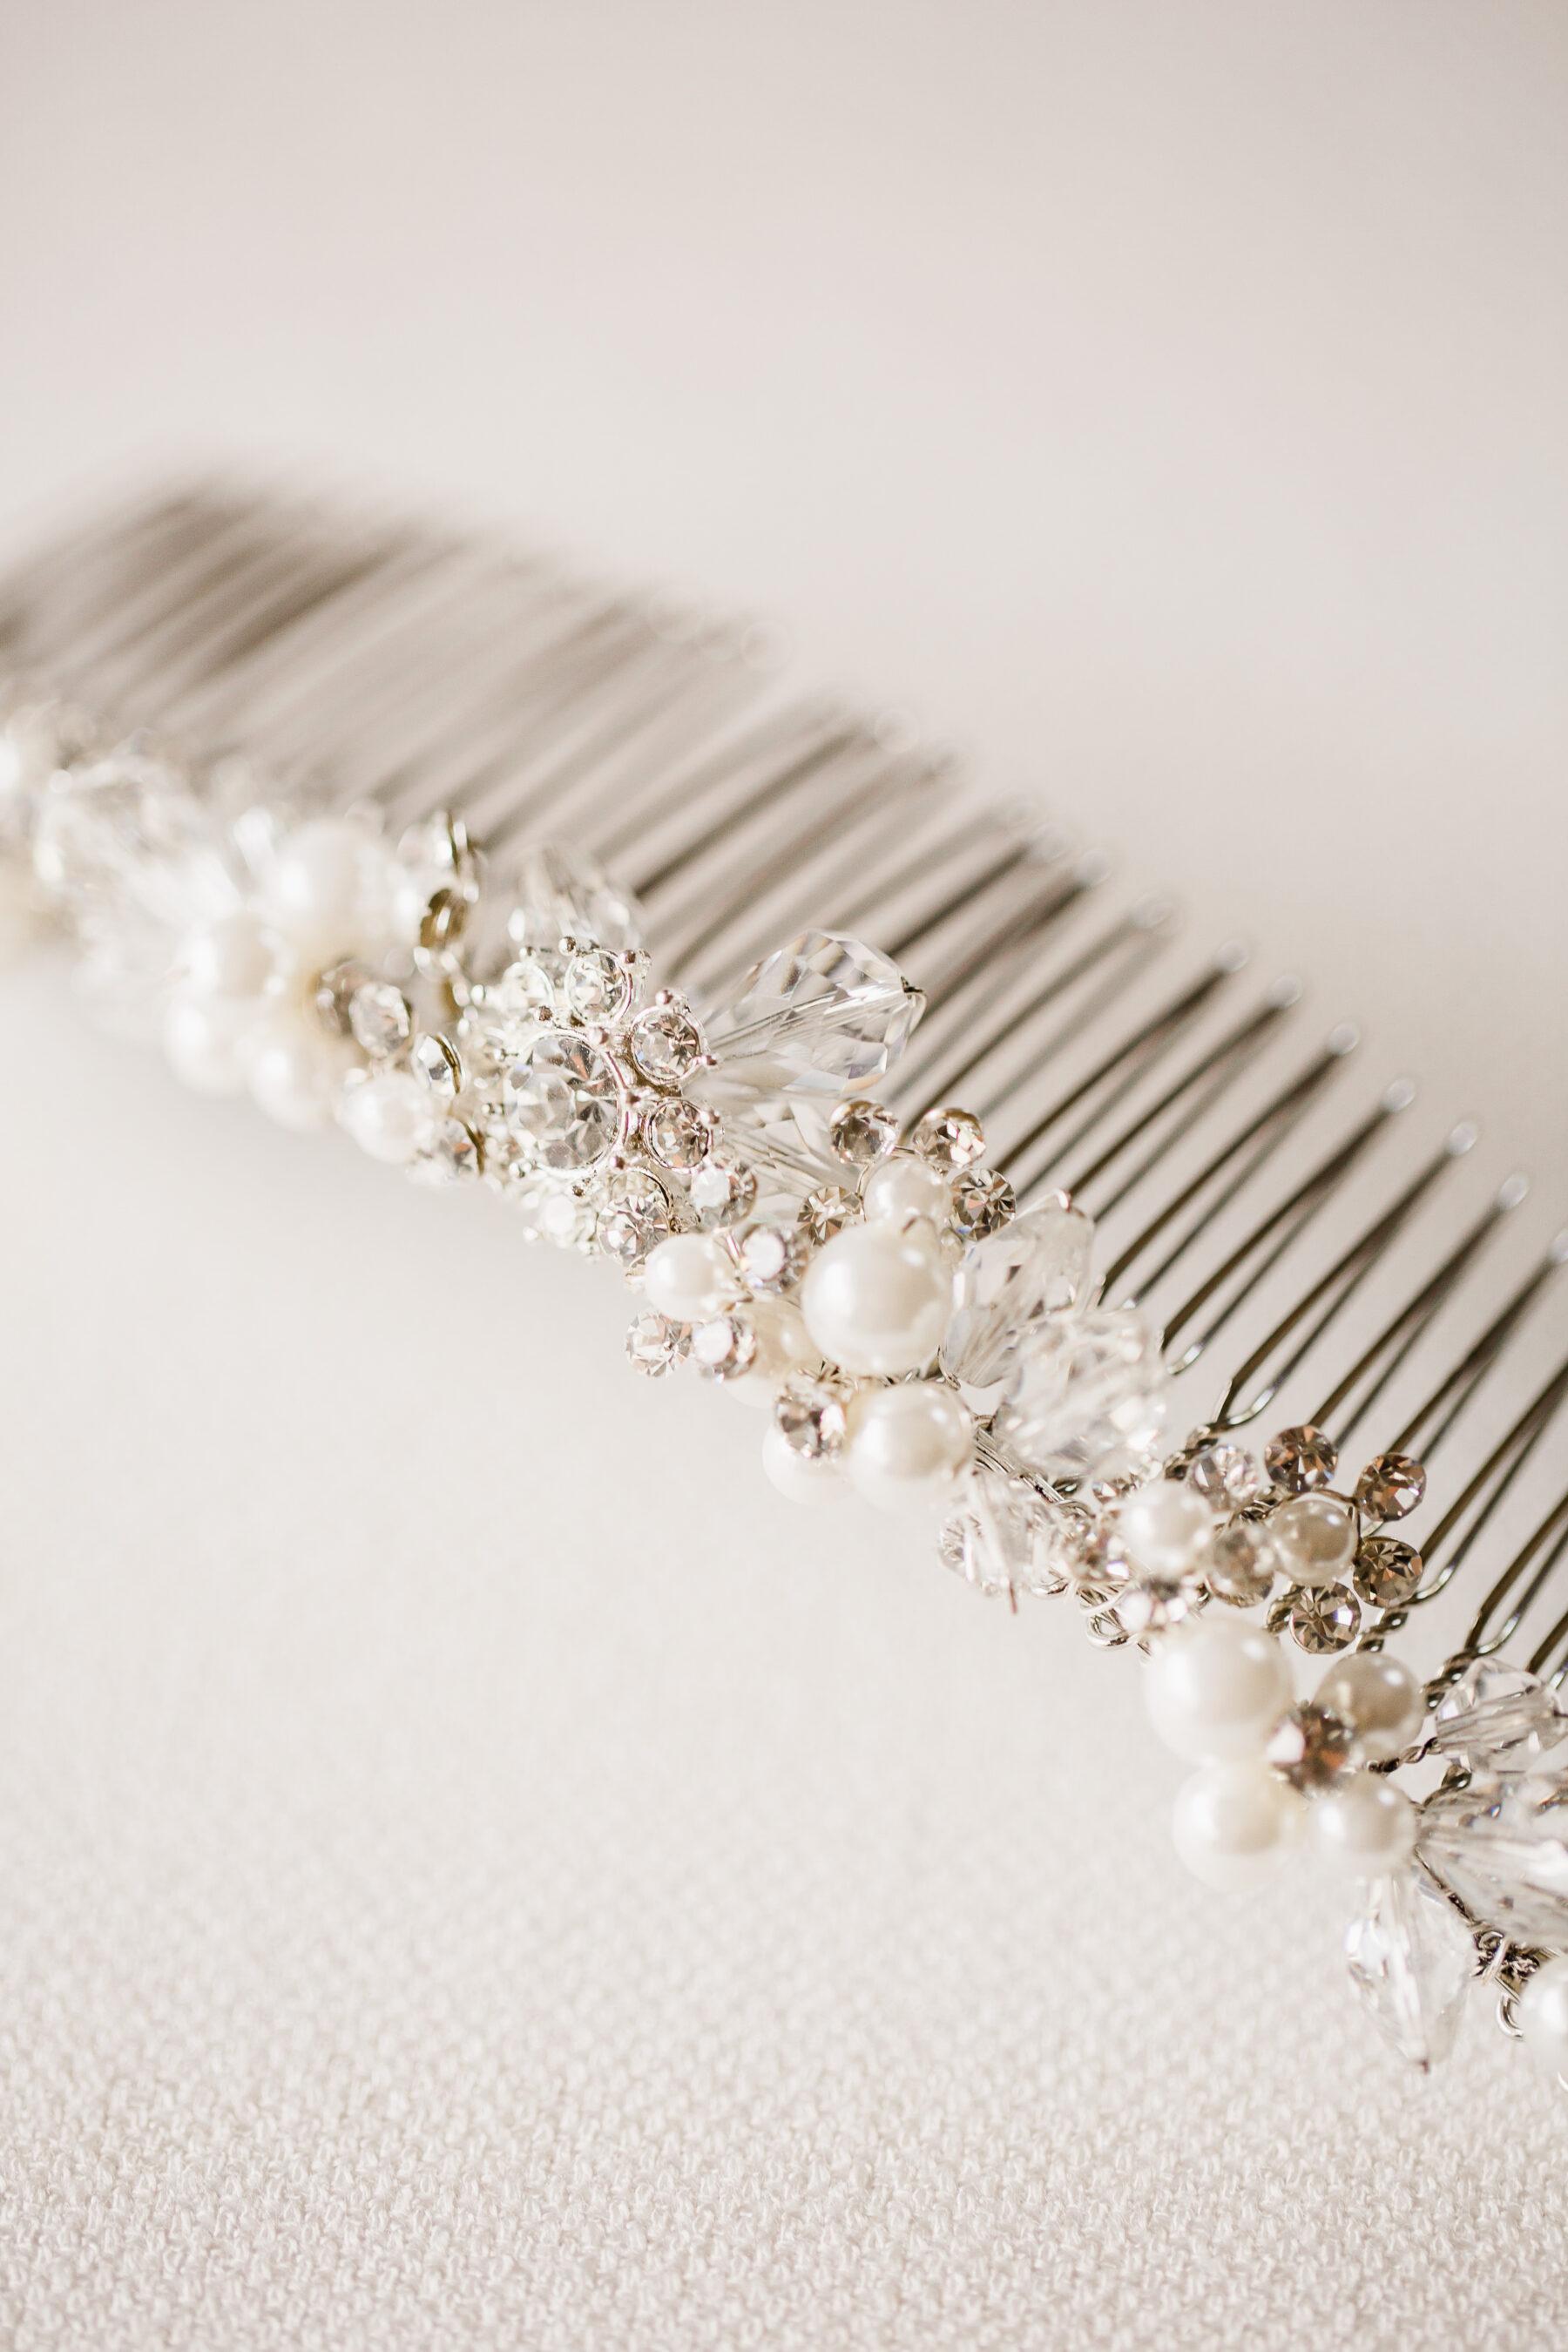 Bel Aire Bridal hair accessory | Nashville Bride Guide